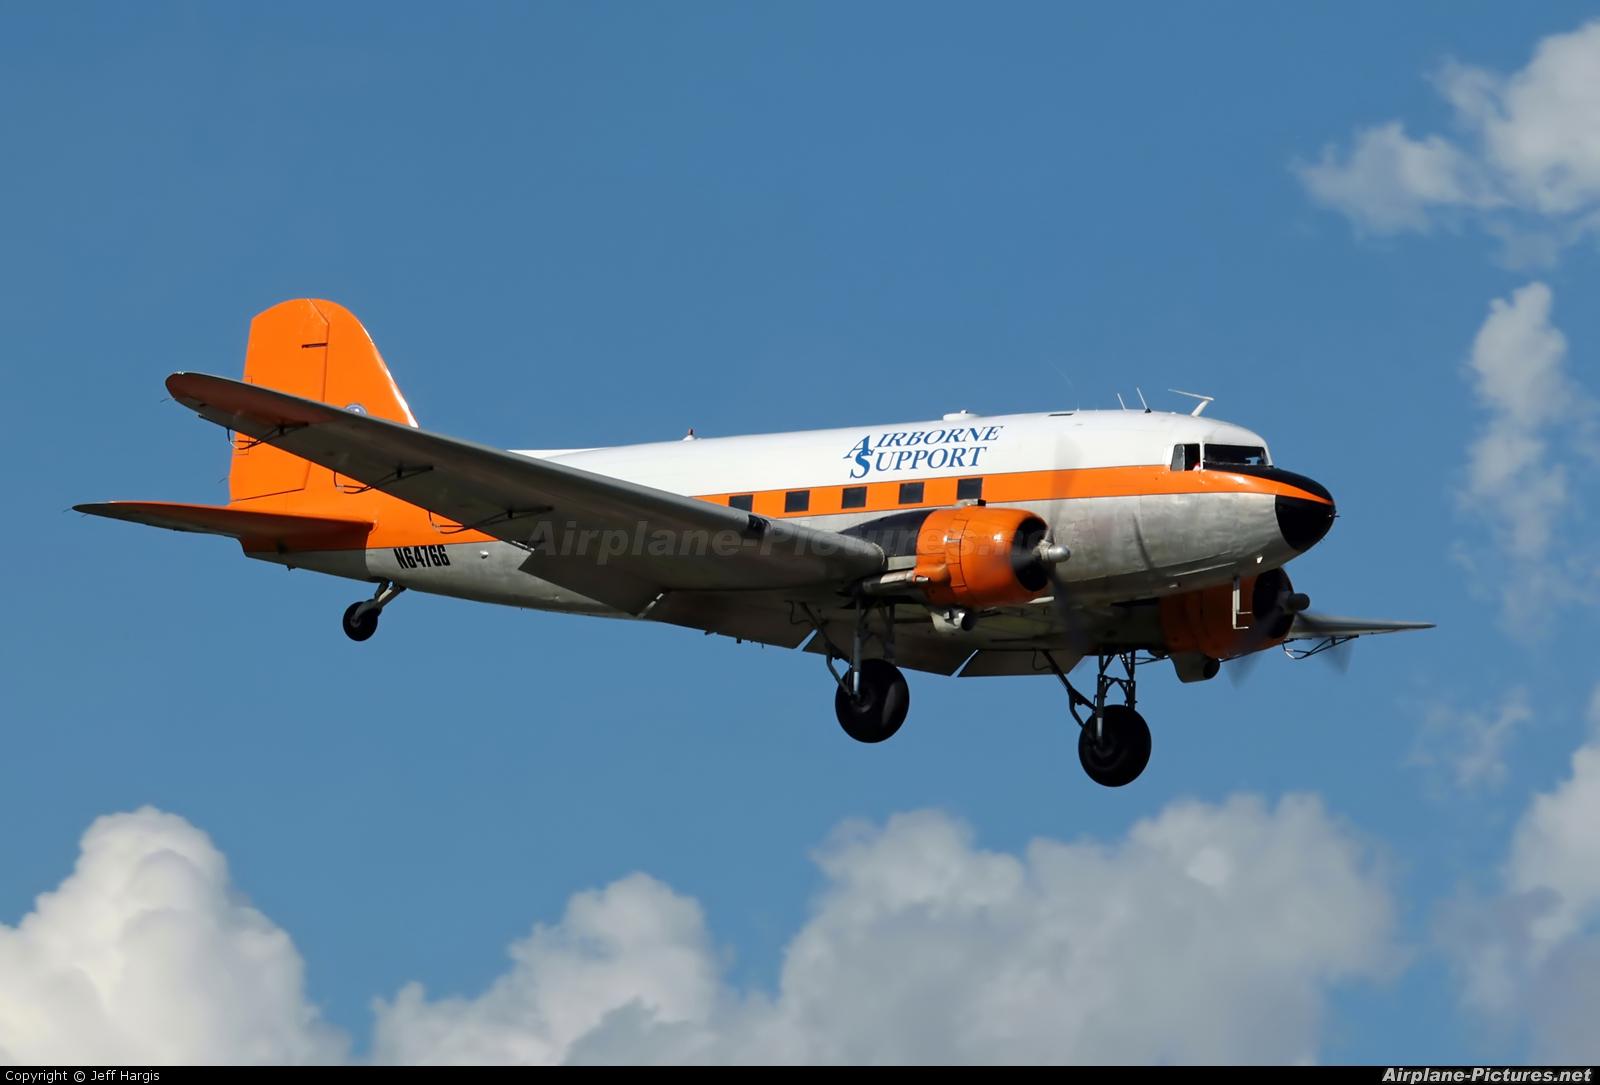 Airborne Support N64766 aircraft at Houma - Terrebonne